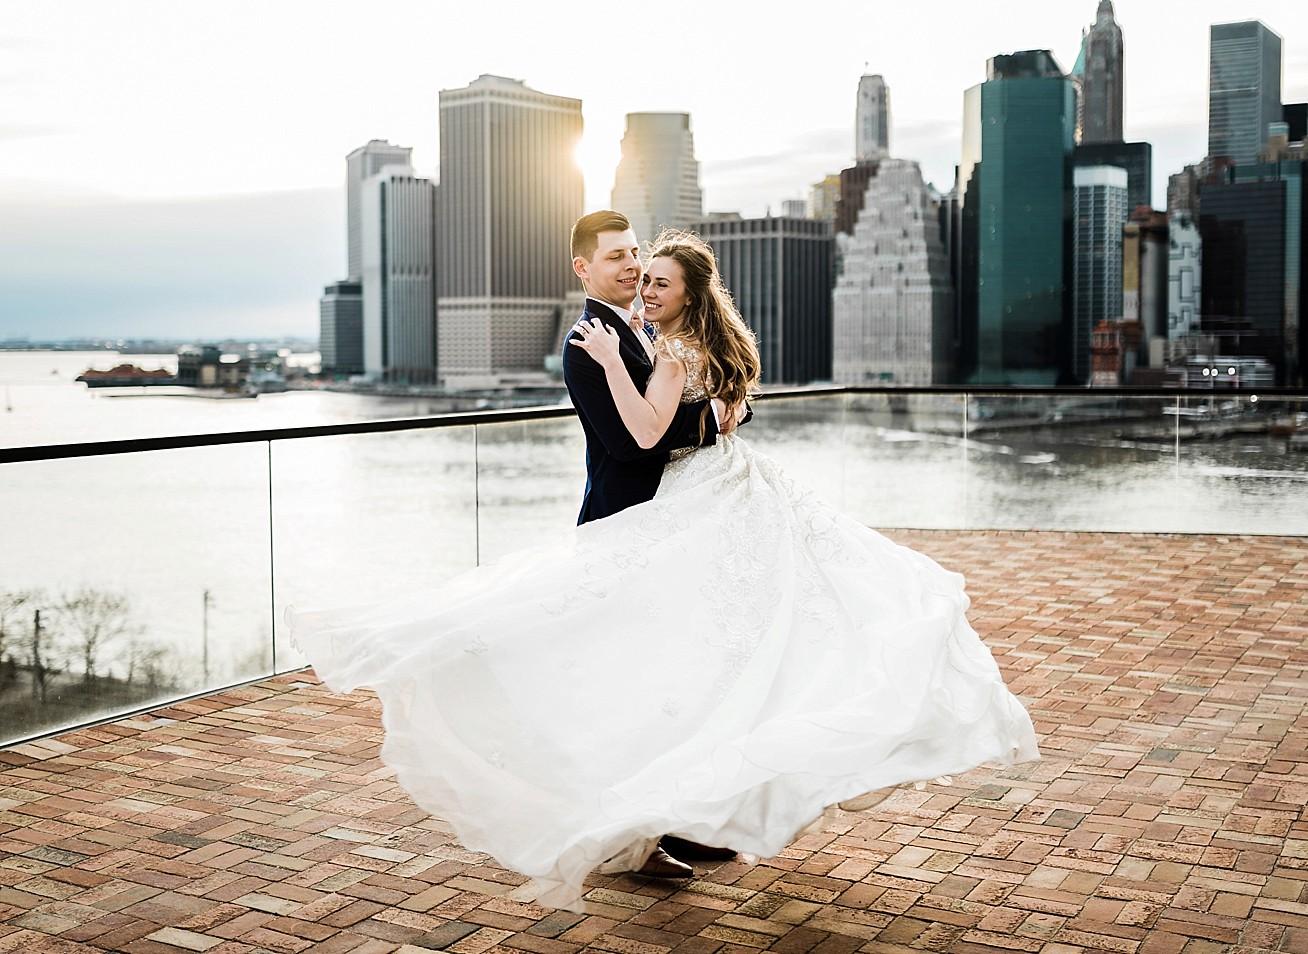 Weddings at 1 Hotel Brooklyn Bridge